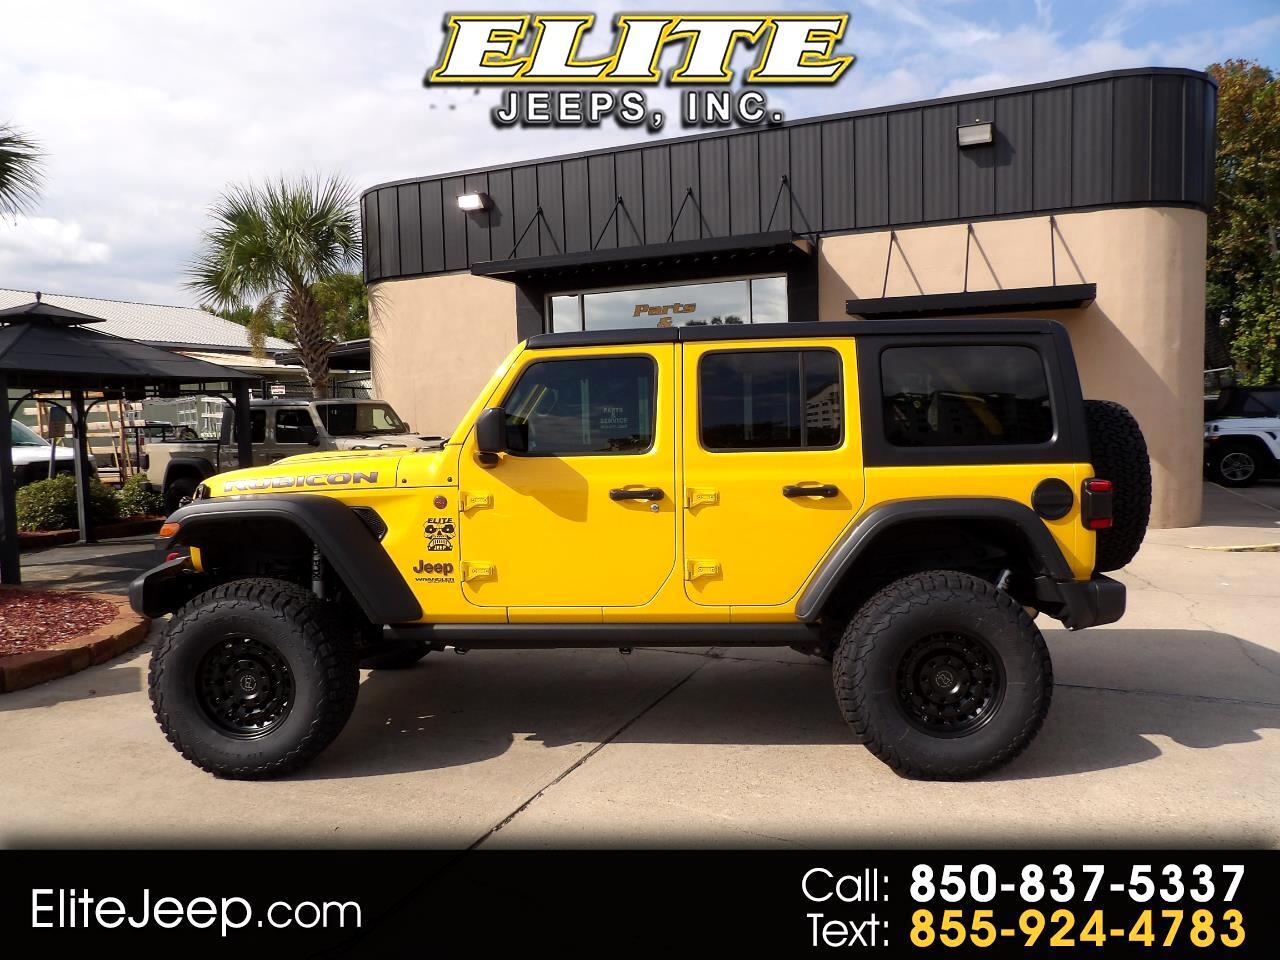 Jeep Wrangler Unlimited Rubicon 4x4 2021